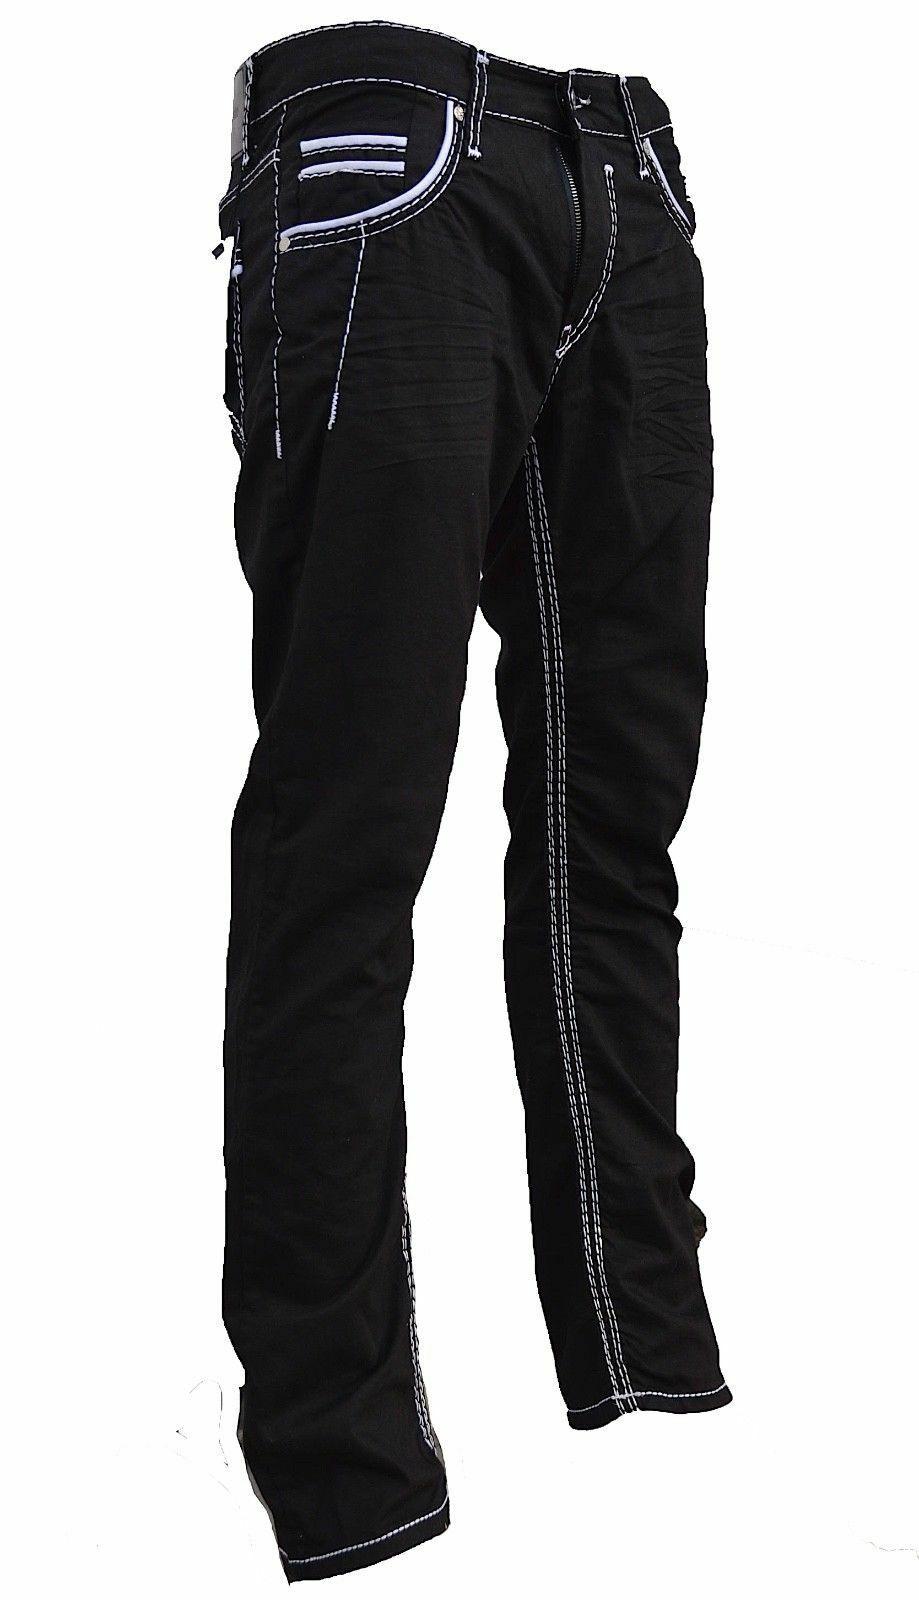 Herren-Jeans-Hose-Denim-KC-Black-Washed-Straight-Cut-Regular-Dicke-Naht-naehte Indexbild 11